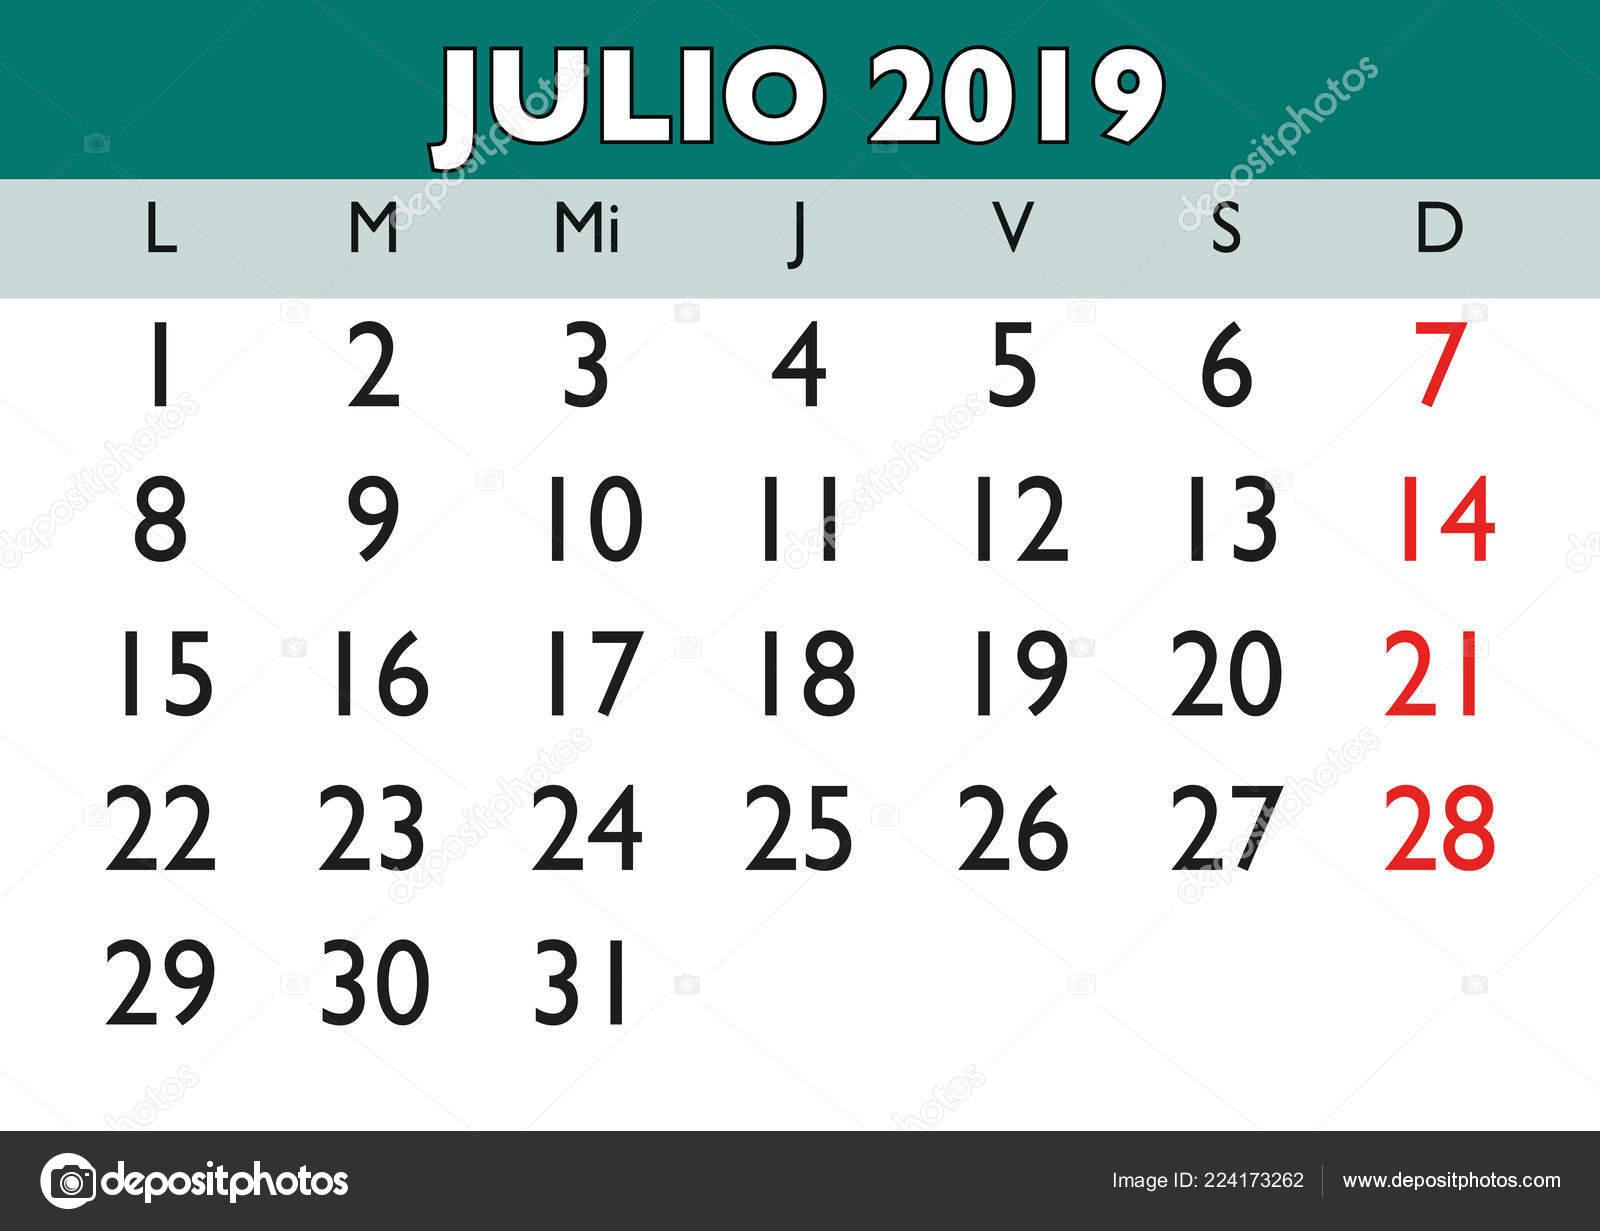 Julio Calendario 2019.July Month Year 2019 Wall Calendar Spanish Julio 2019 Calendario